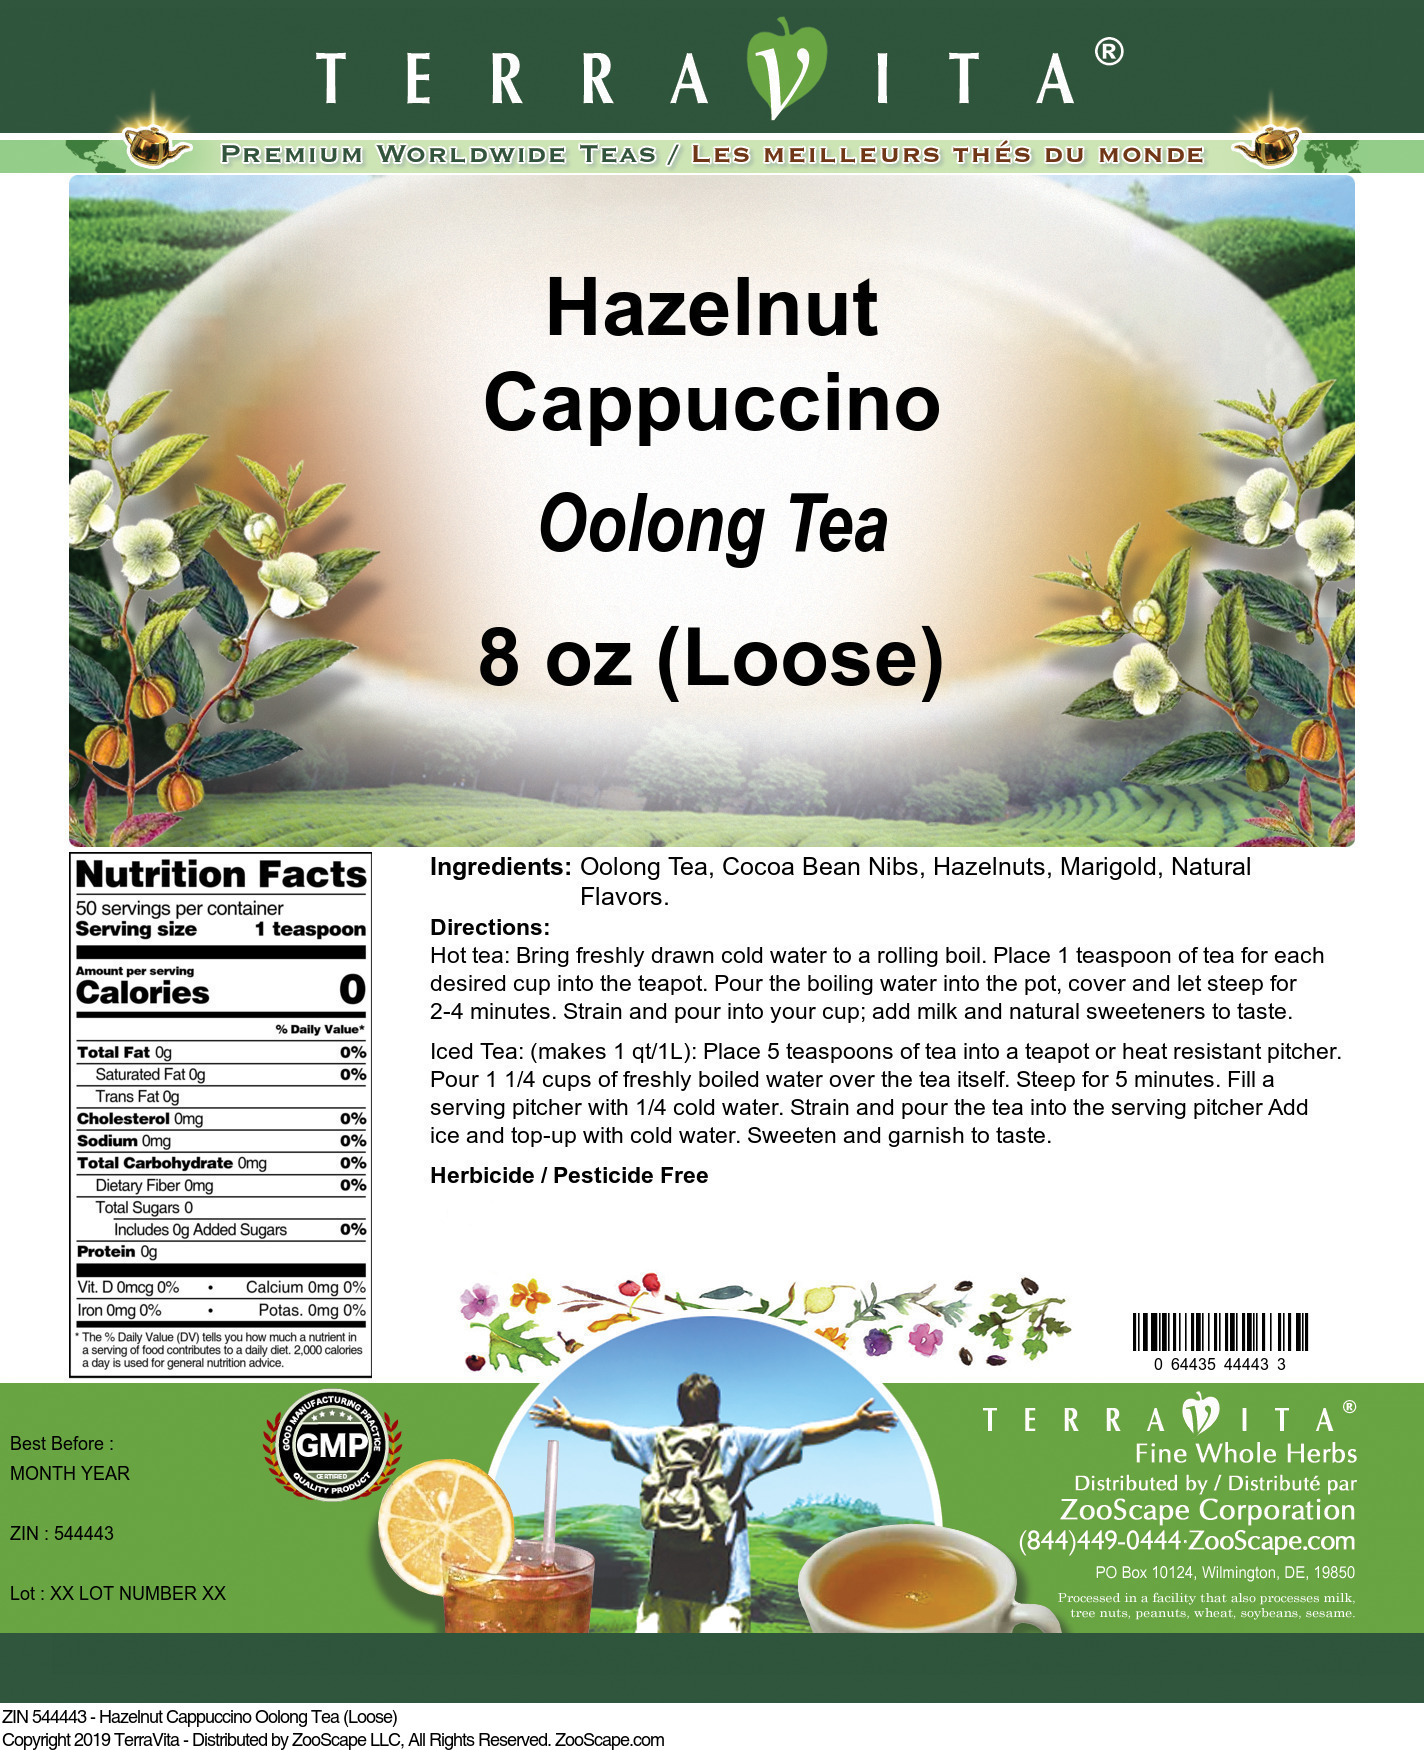 Hazelnut Cappuccino Oolong Tea